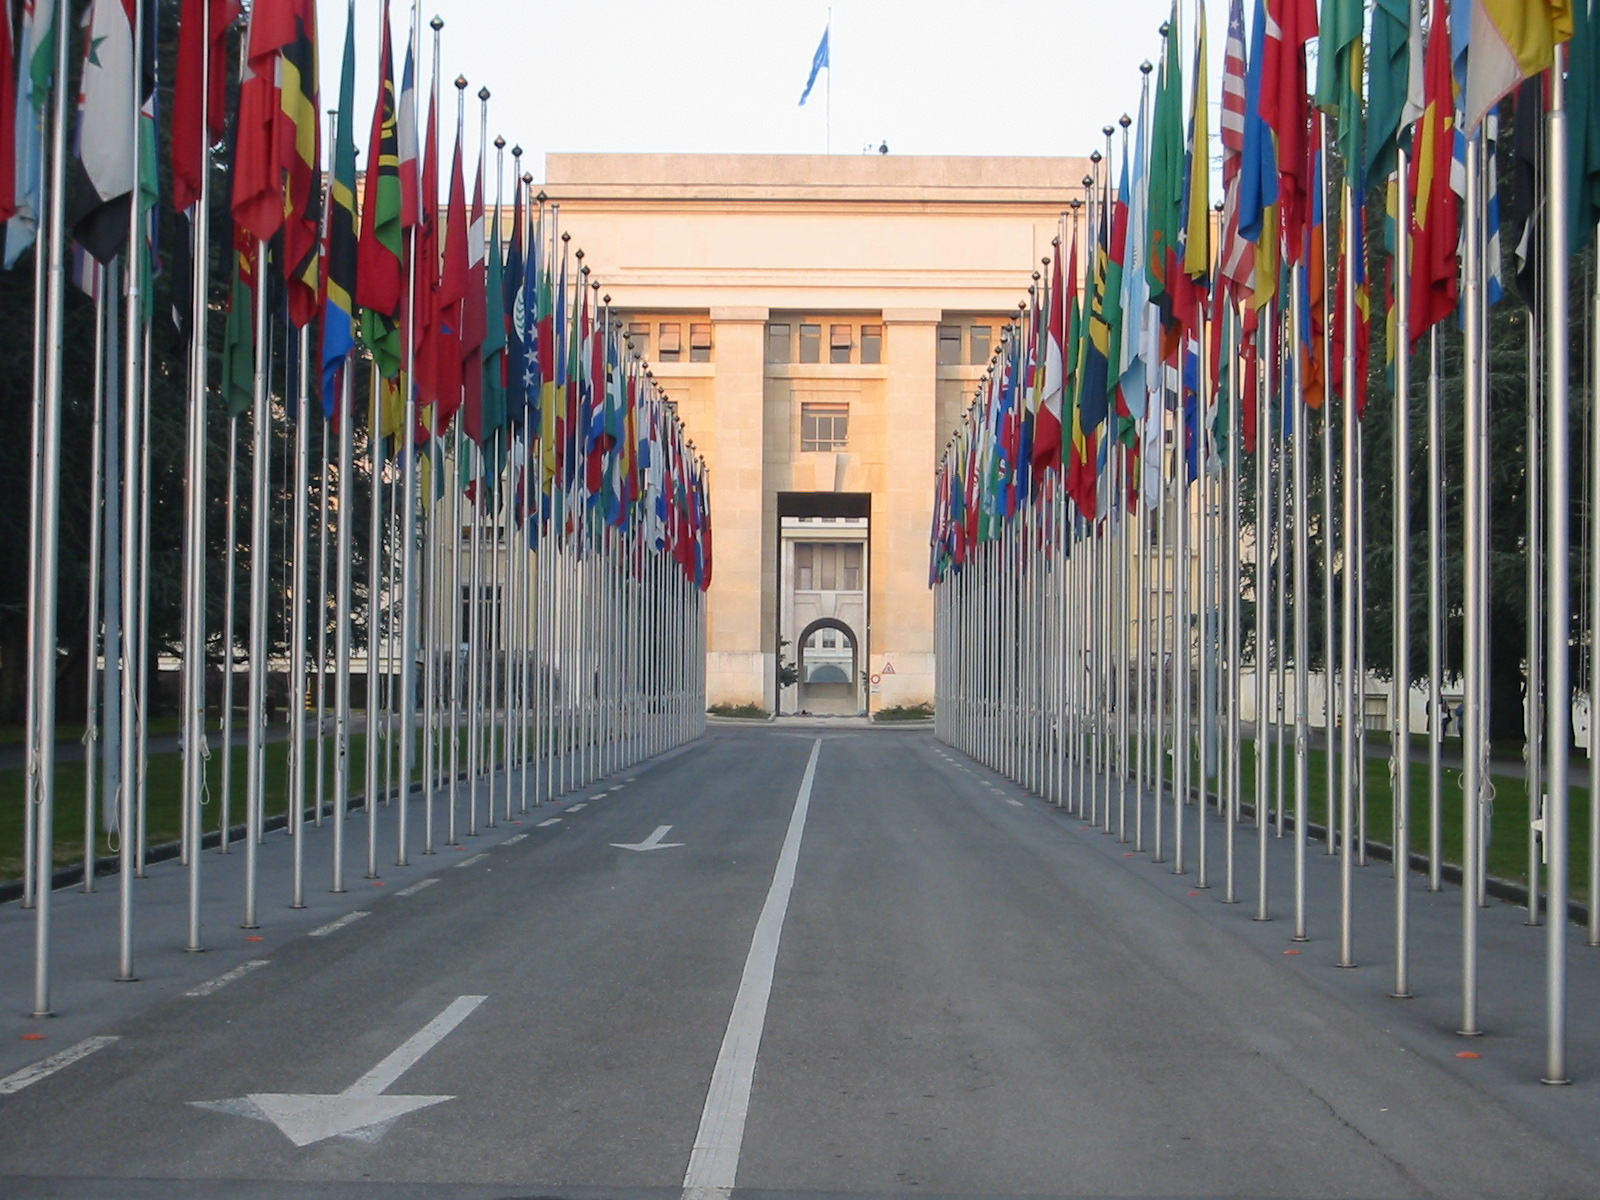 http://fr.academic.ru/pictures/frwiki/70/Flags_onu_geneva2.jpg